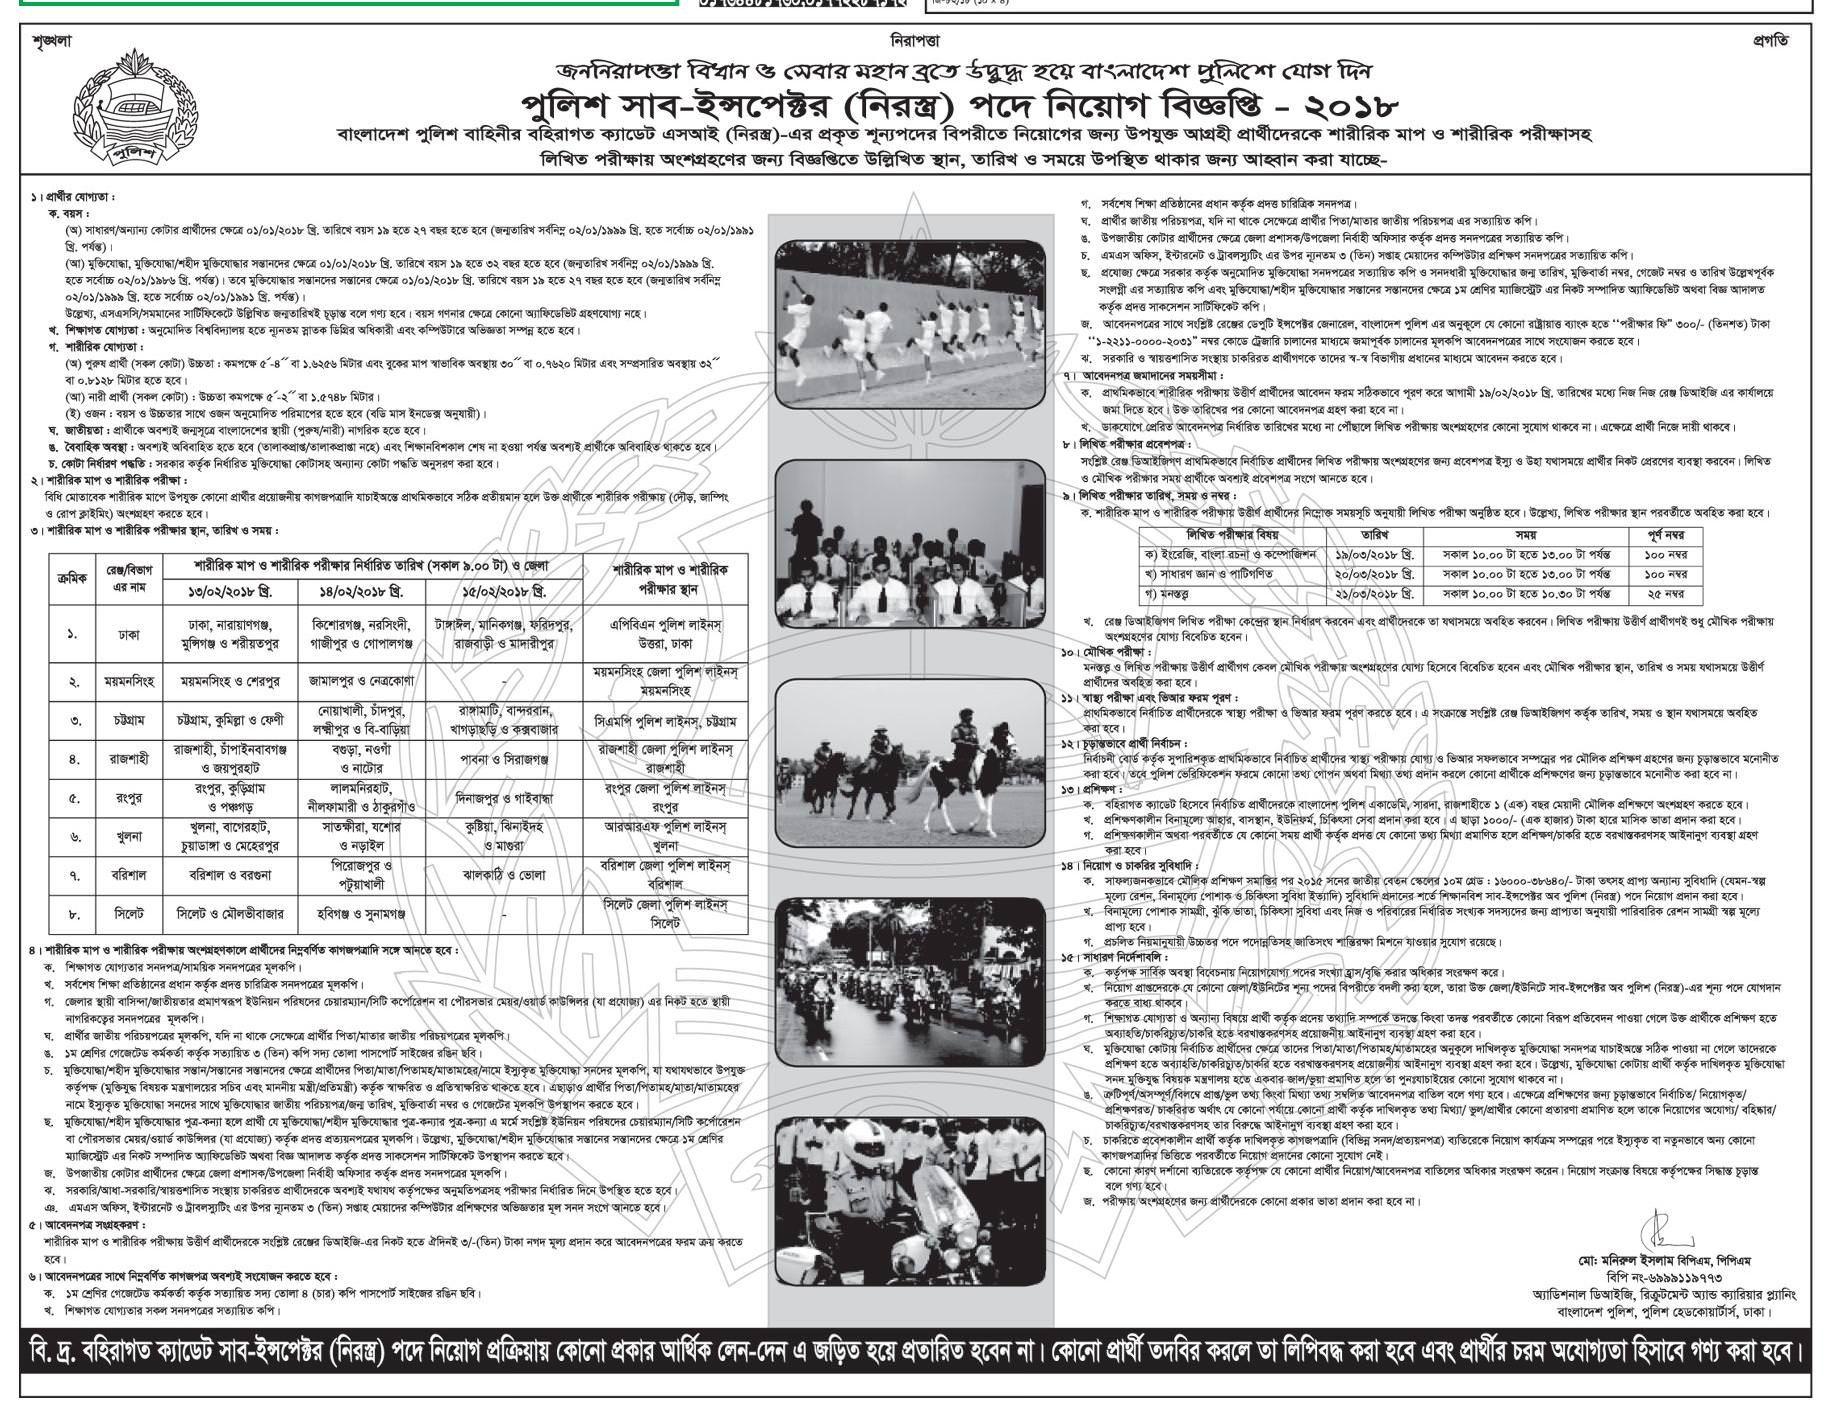 Bangladesh Police Sub Inspector SI Jobs Circular 2020 Pdf